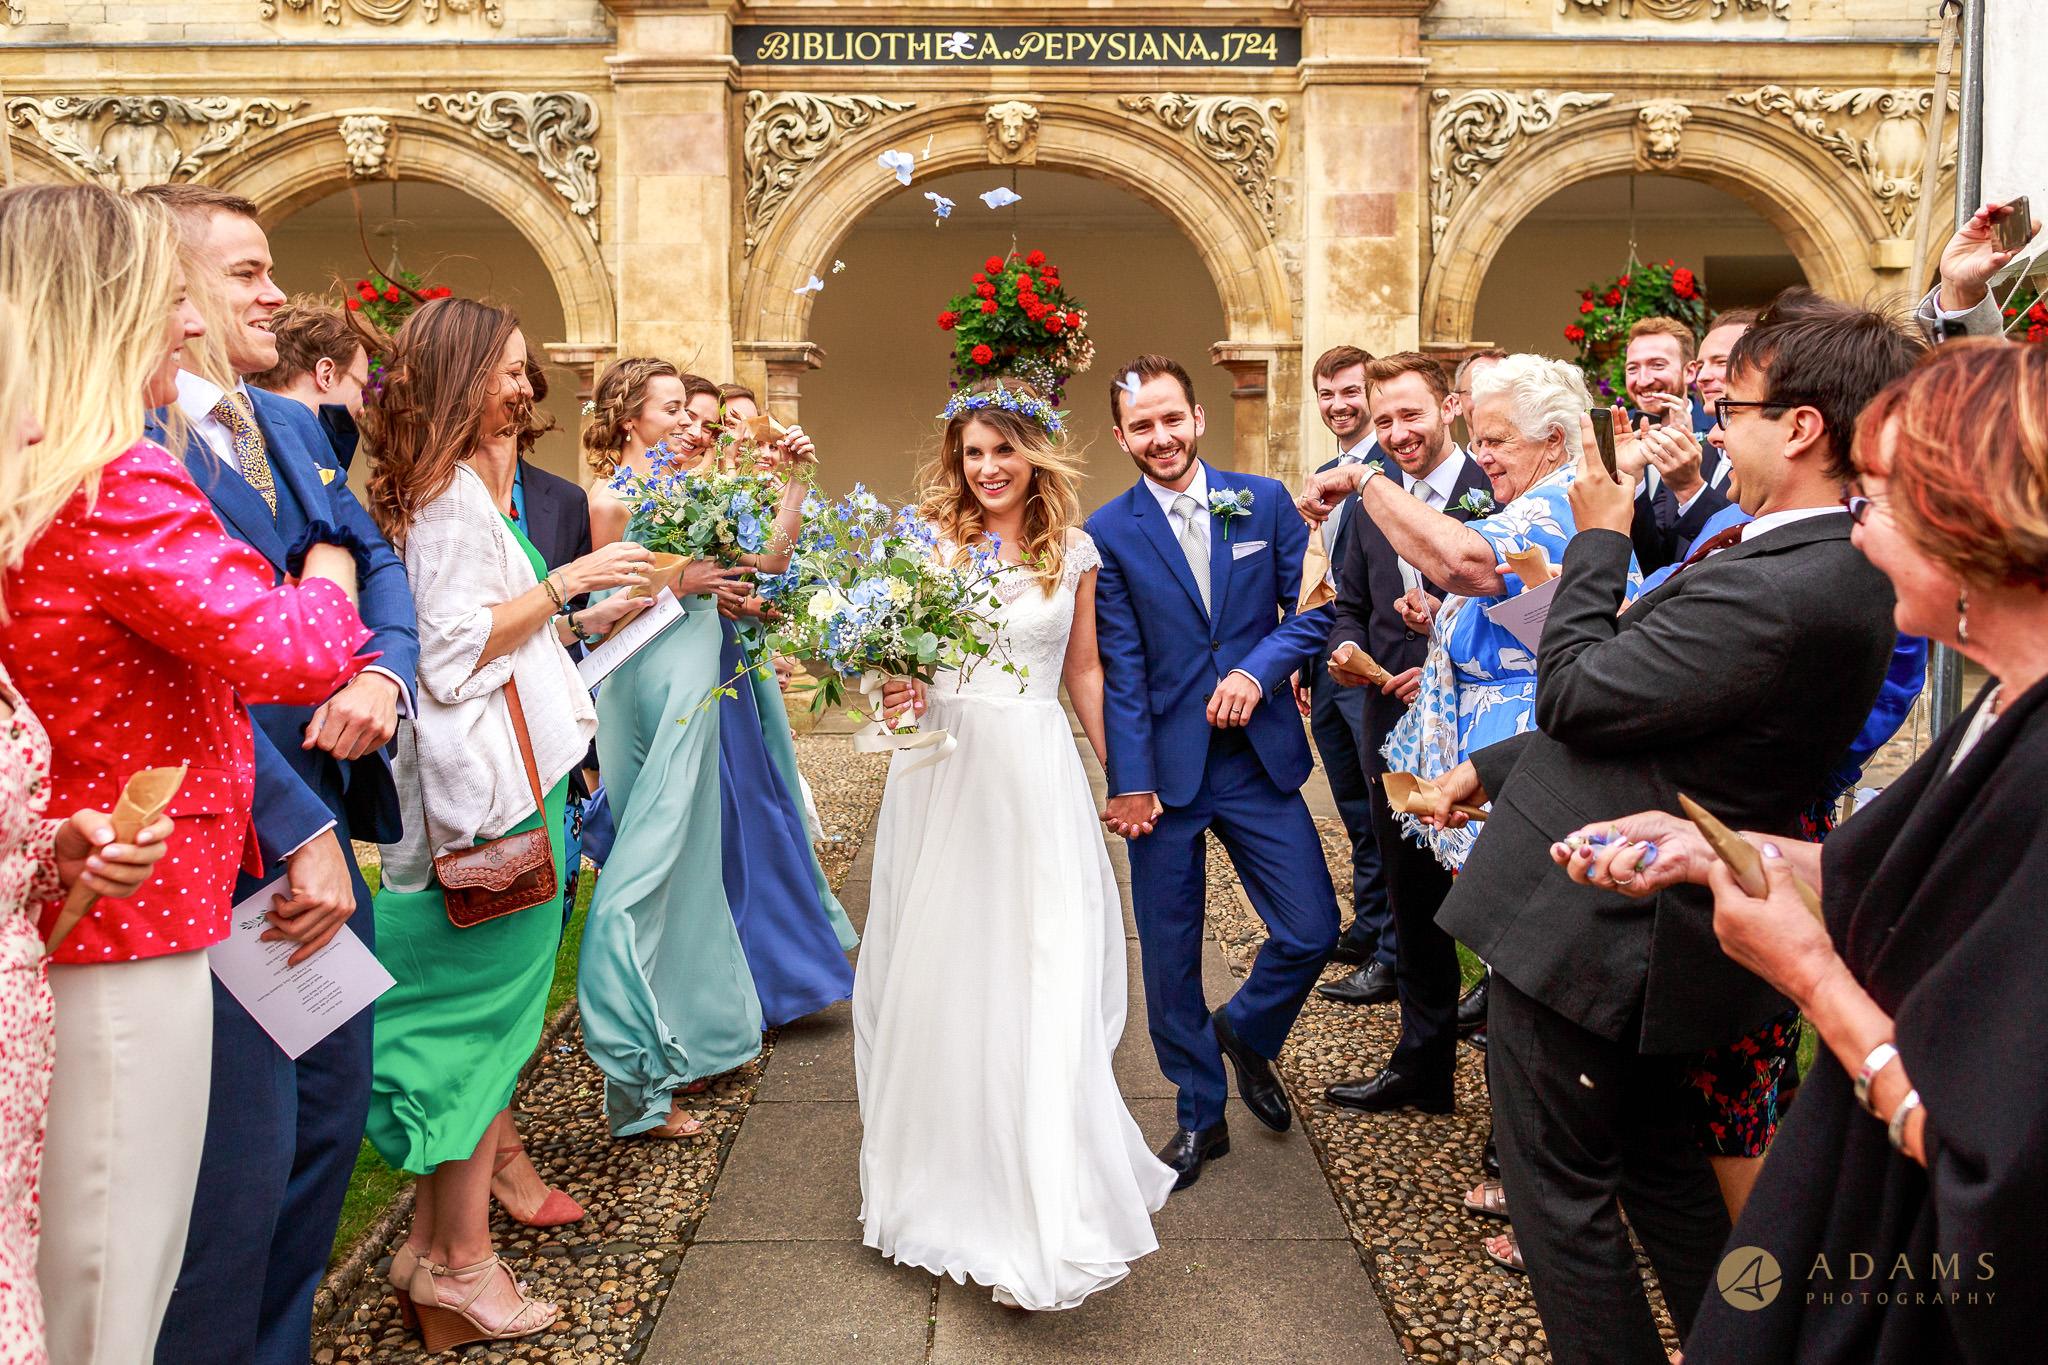 Wedding Photographer Cambridge confetti shot